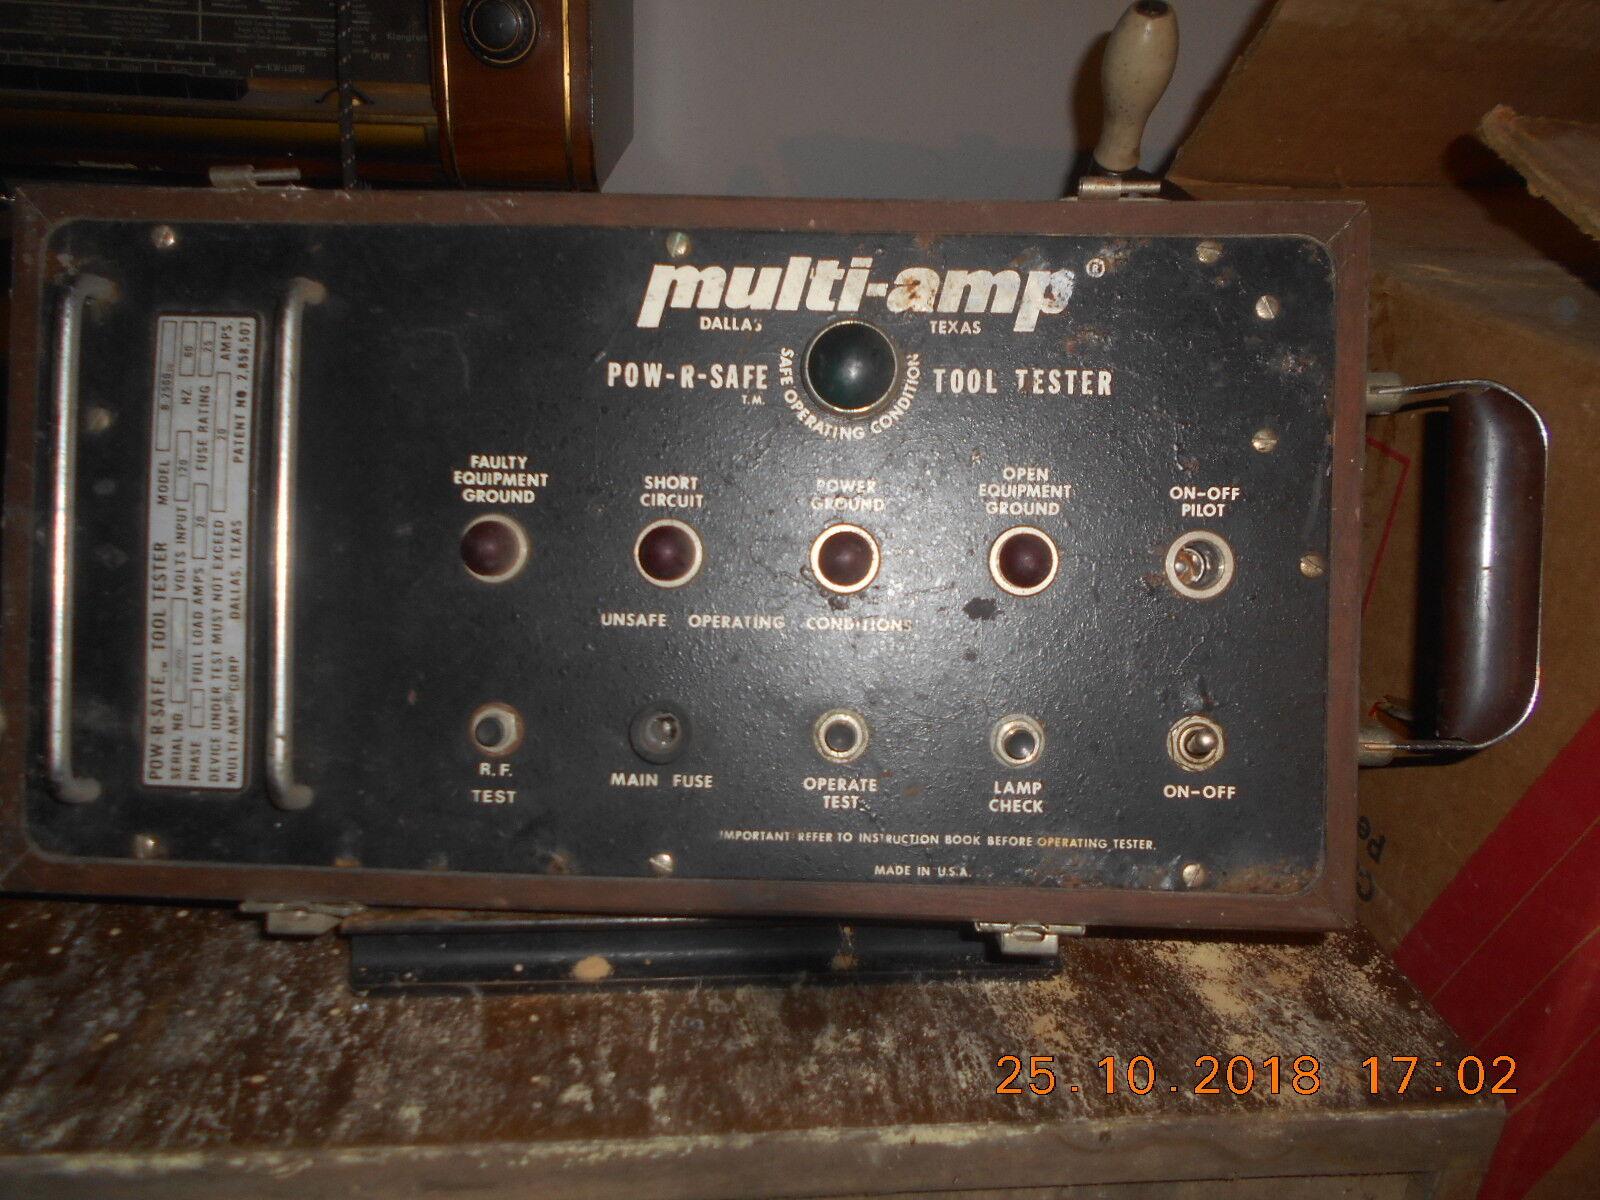 MULTI AMP- POW -R-SAFE  -  TOOL TESTER - USA - STRUMENTO PER LABORATORIO